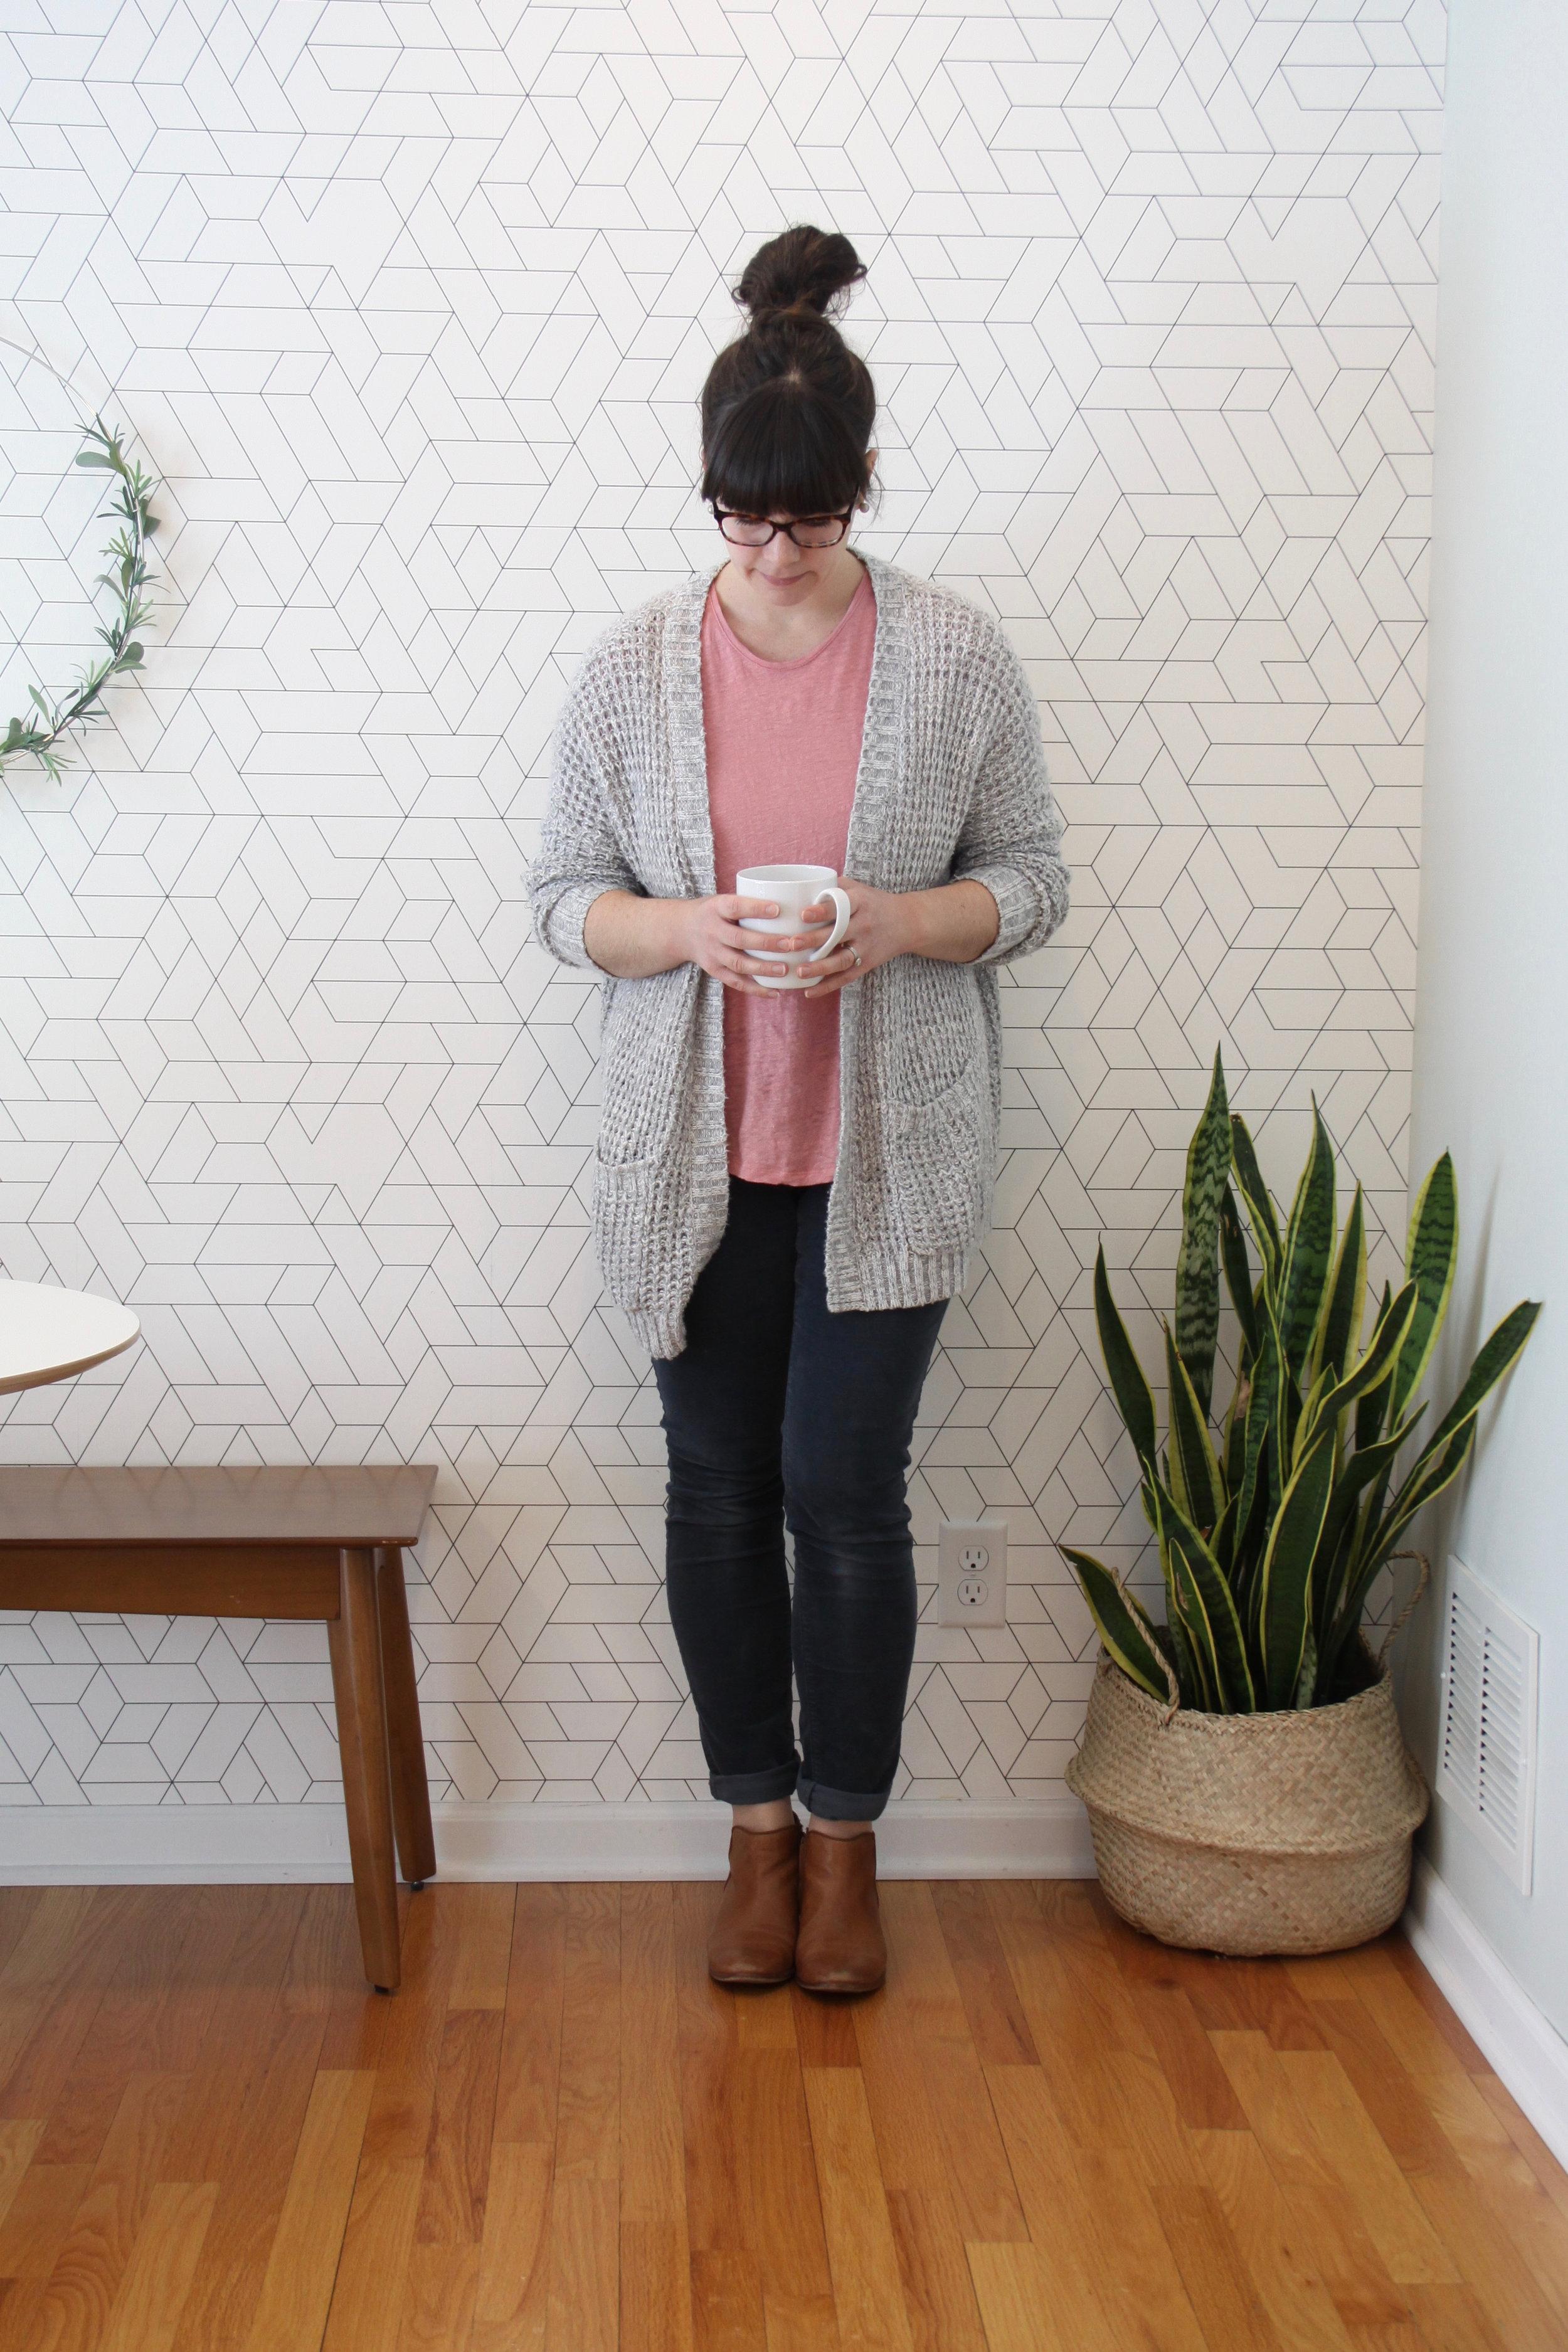 Spring 10x10 Capsule Wardrobe Challenge Pink Linen Tee and Cardigan